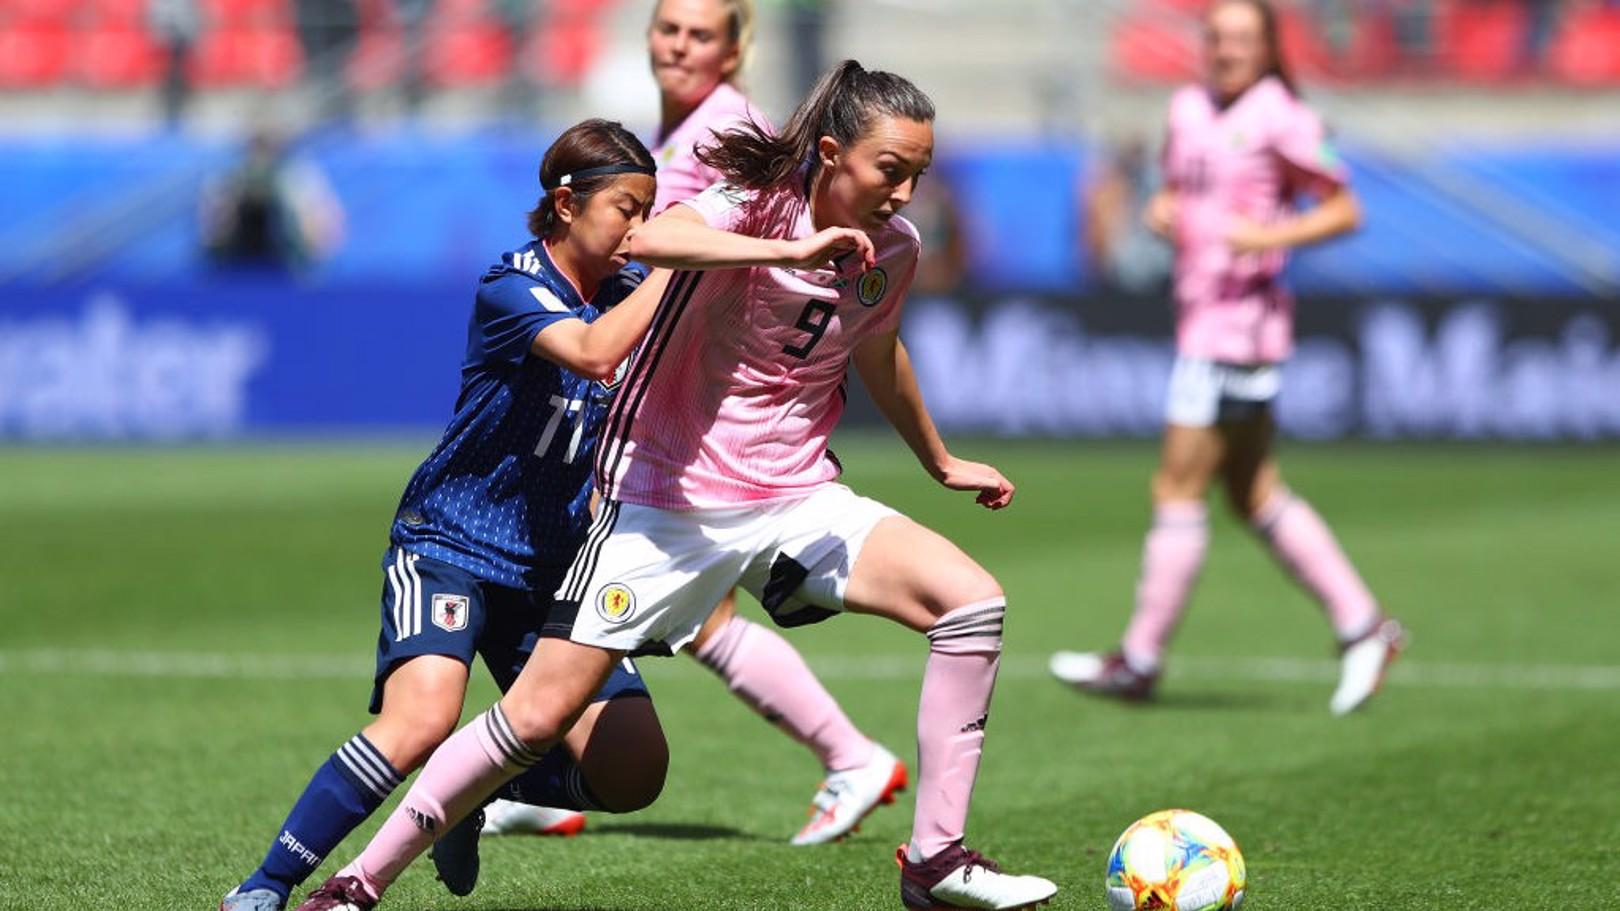 IN ACTION: Caroline Weir battles for possession against Japan.